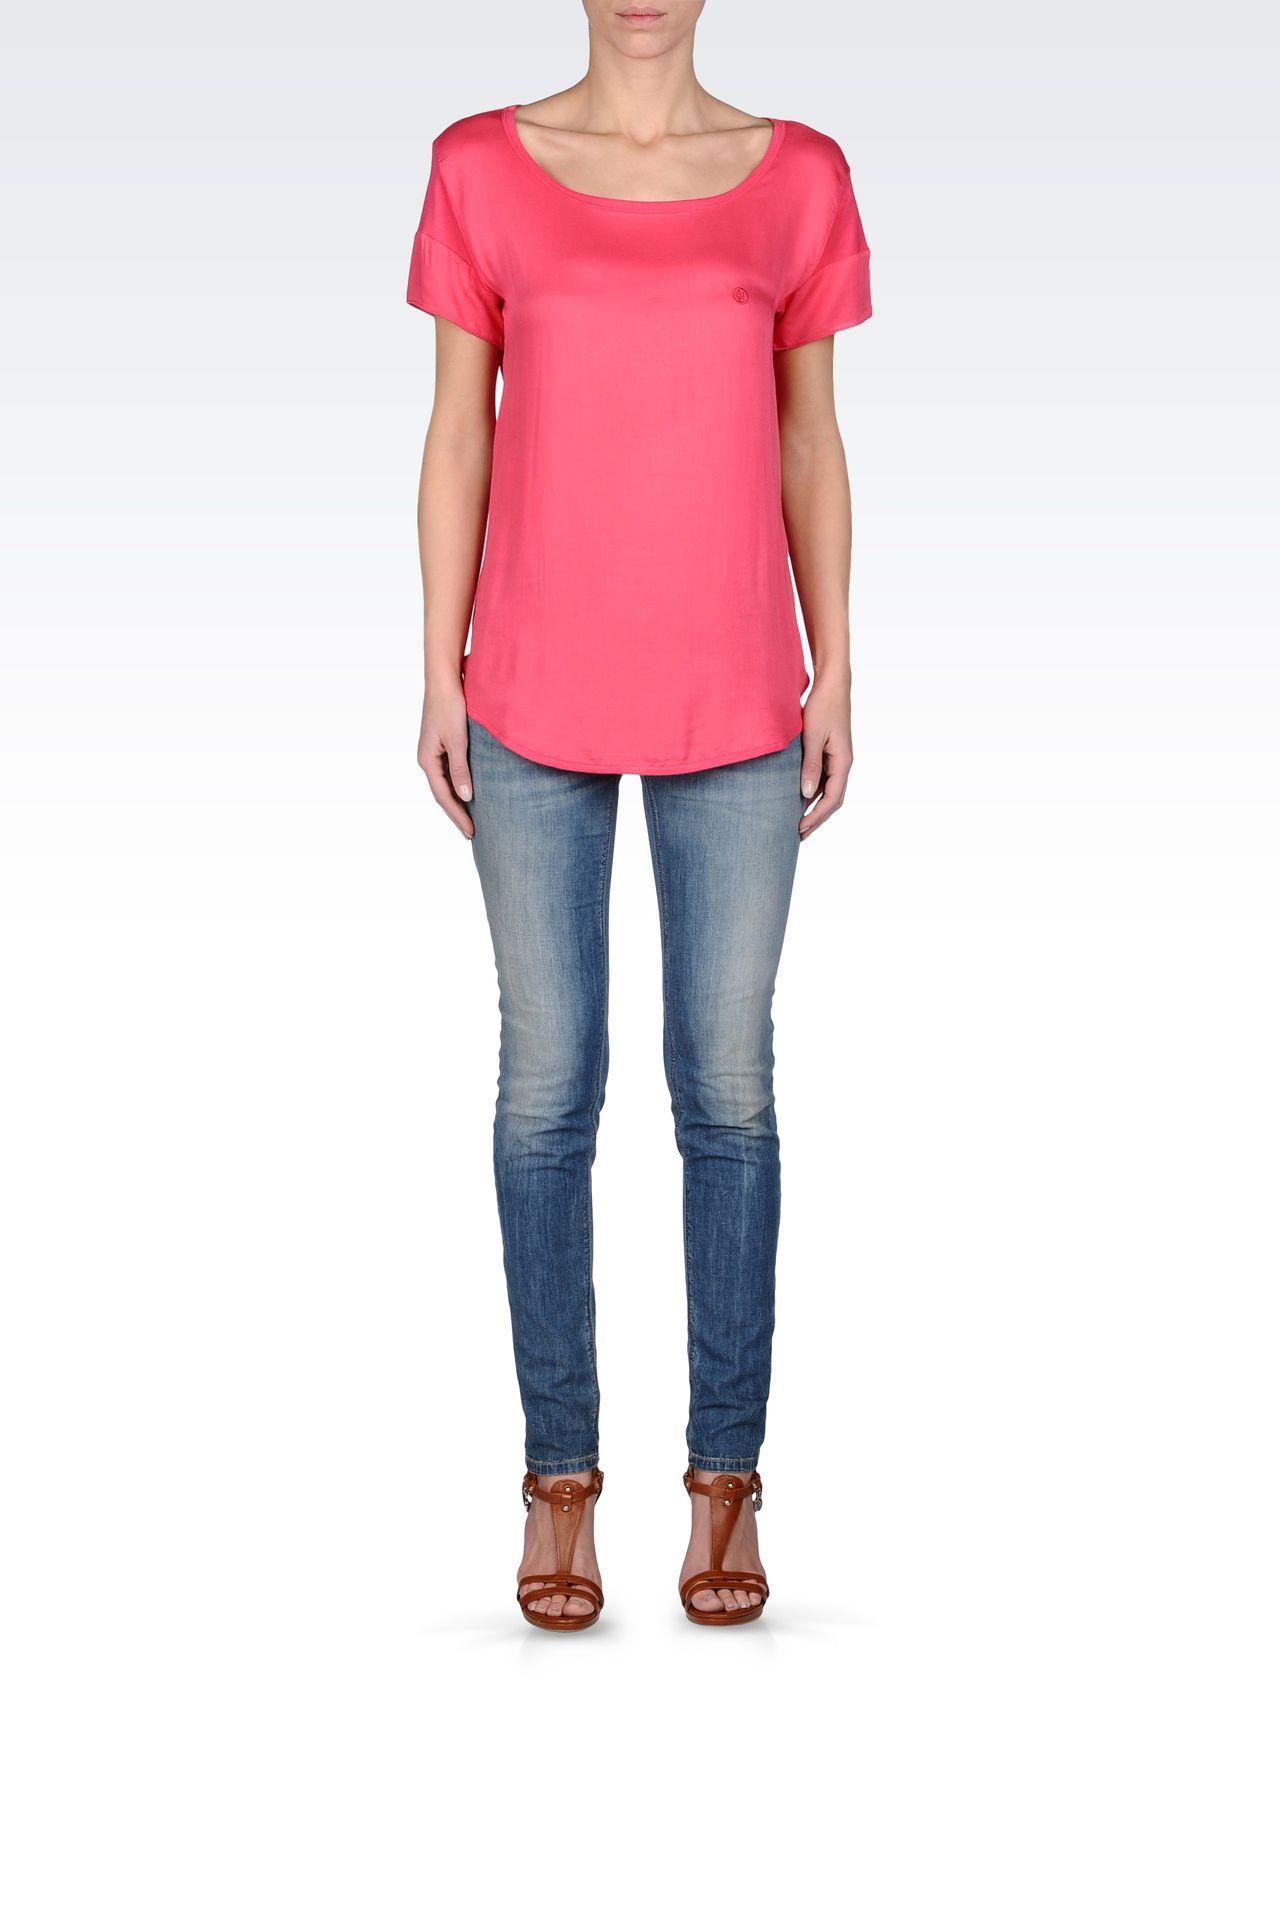 VINTAGE EFFECT SKINNY JEANS : Jeans Women by Armani - 0